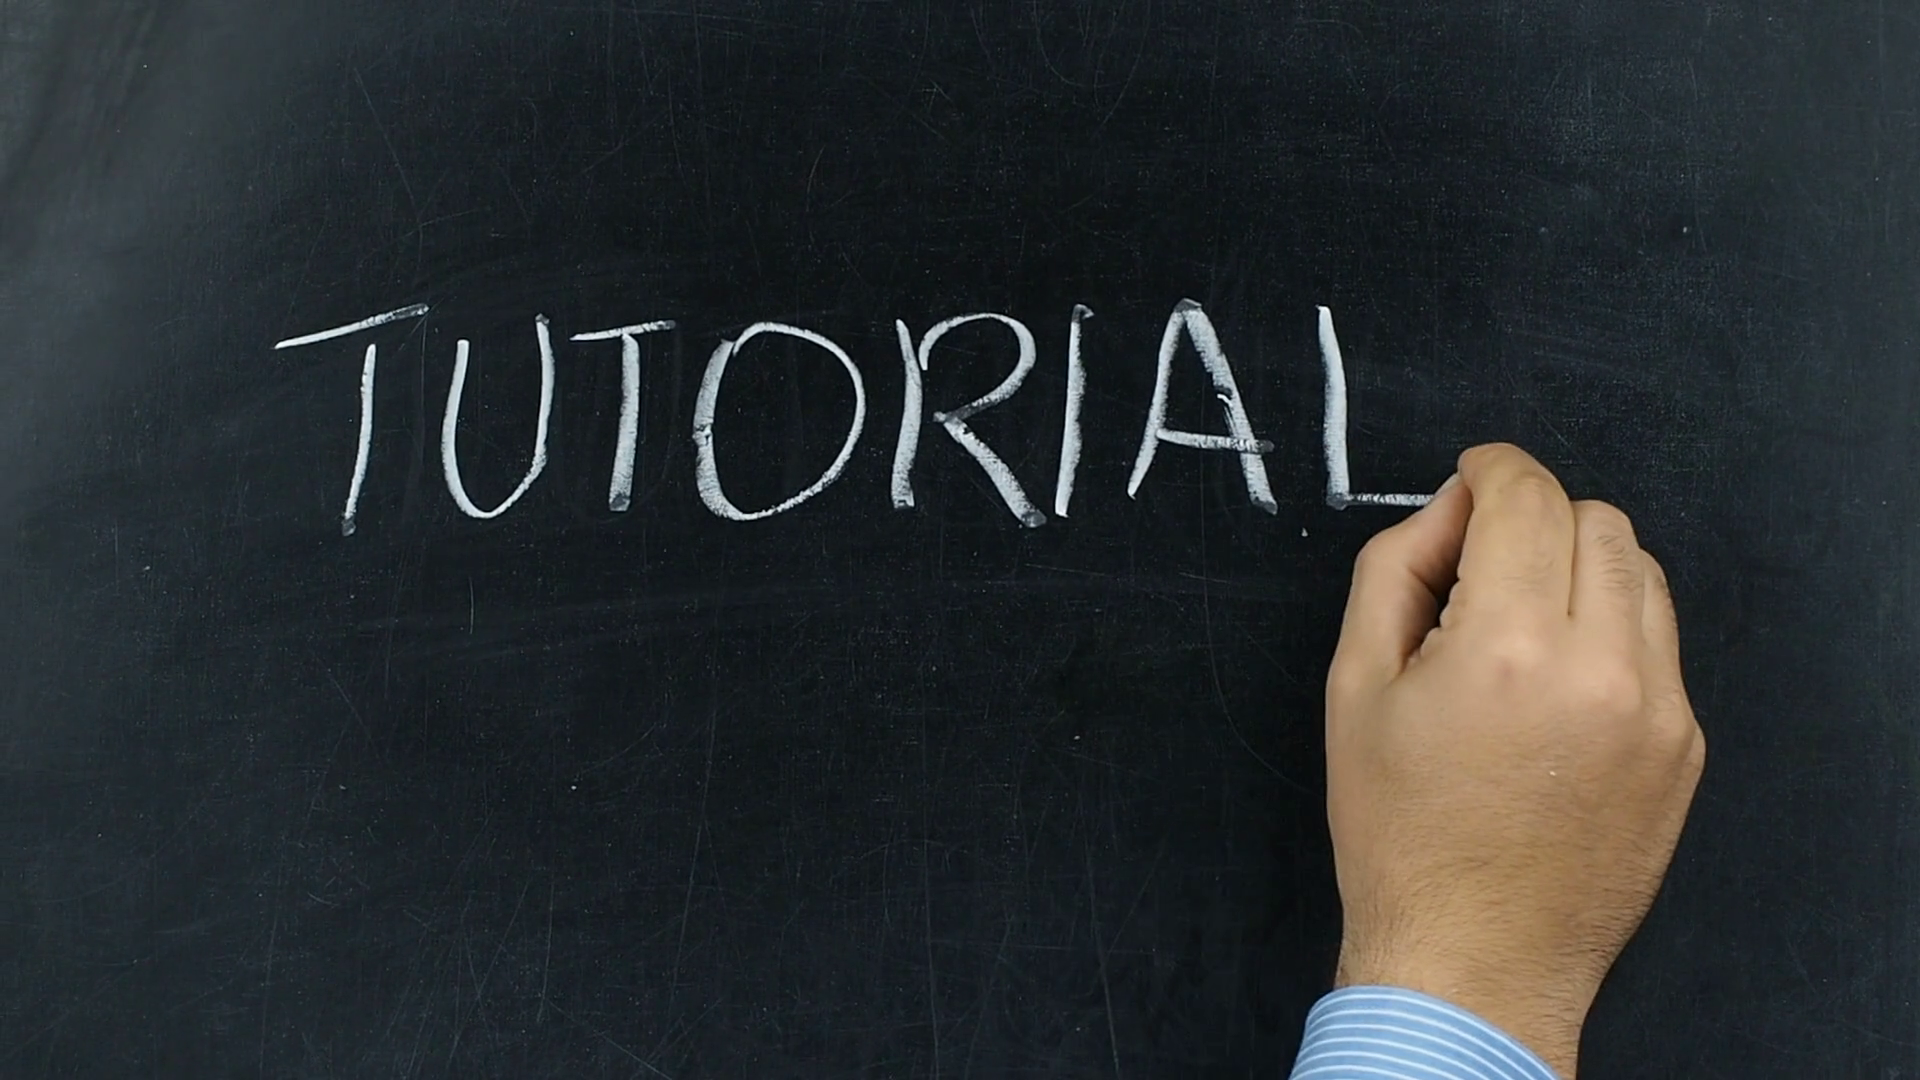 wealth-writing-on-chalkboard-businessman-tutorial-or-blackboard-stock-video.png